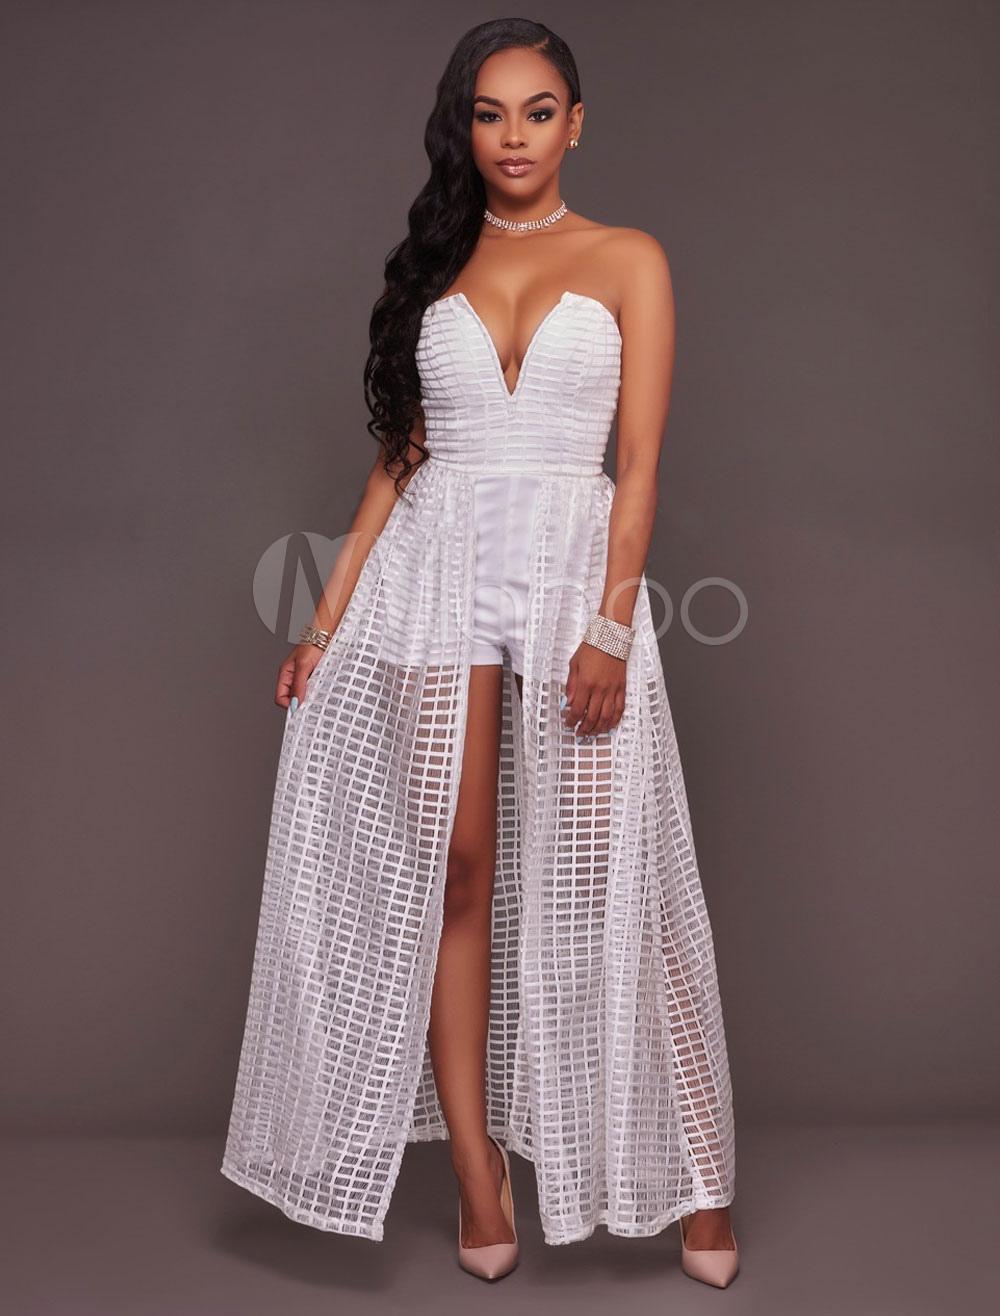 Women's White Romper Strapless Sweetheart Fake Two Piece Style Chic Skort Dress